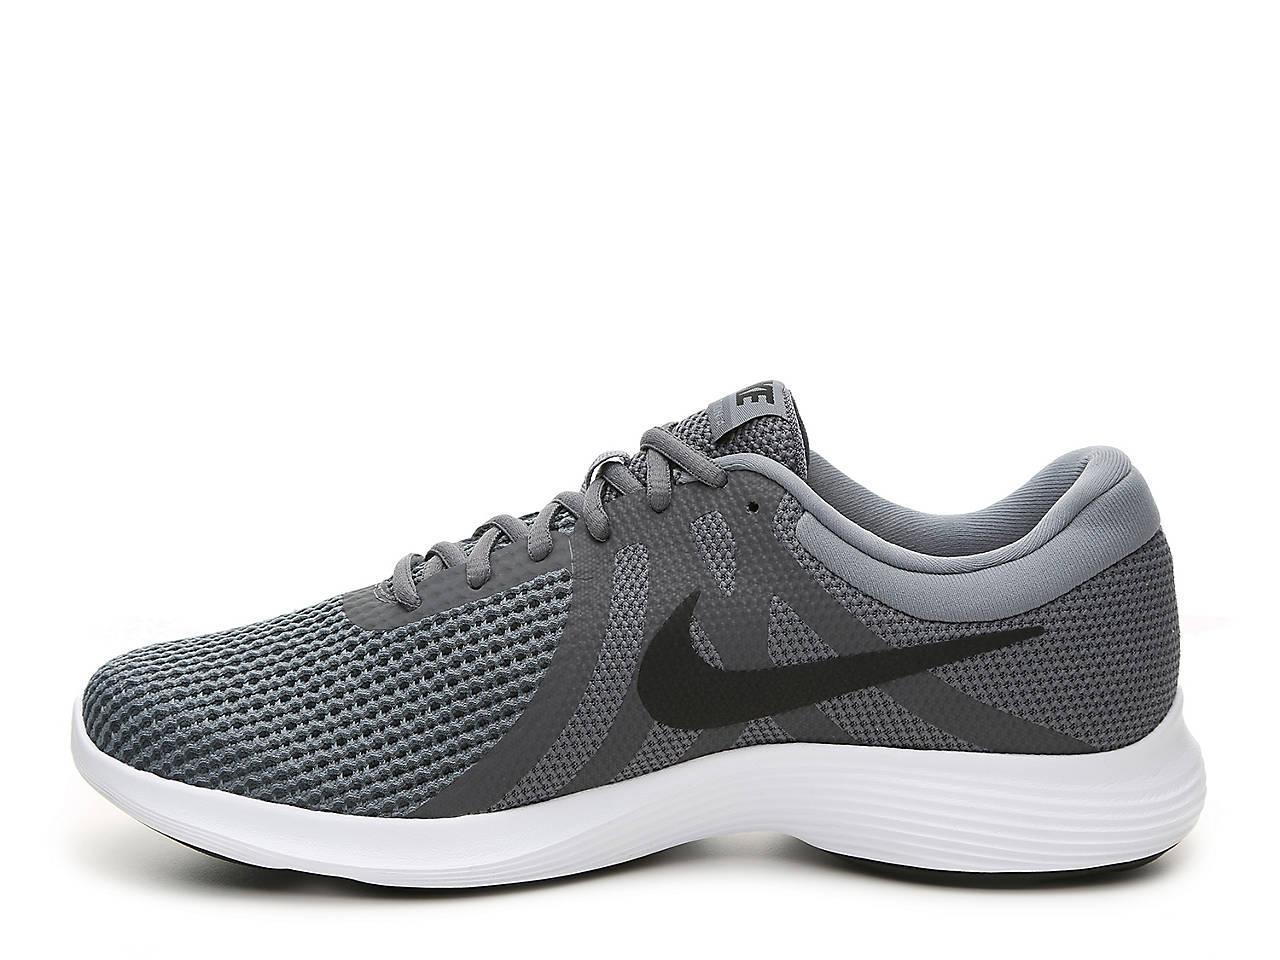 9b4e4fdcaf8d Nike Revolution 4 Lightweight Running Shoe - Men s Men s Shoes